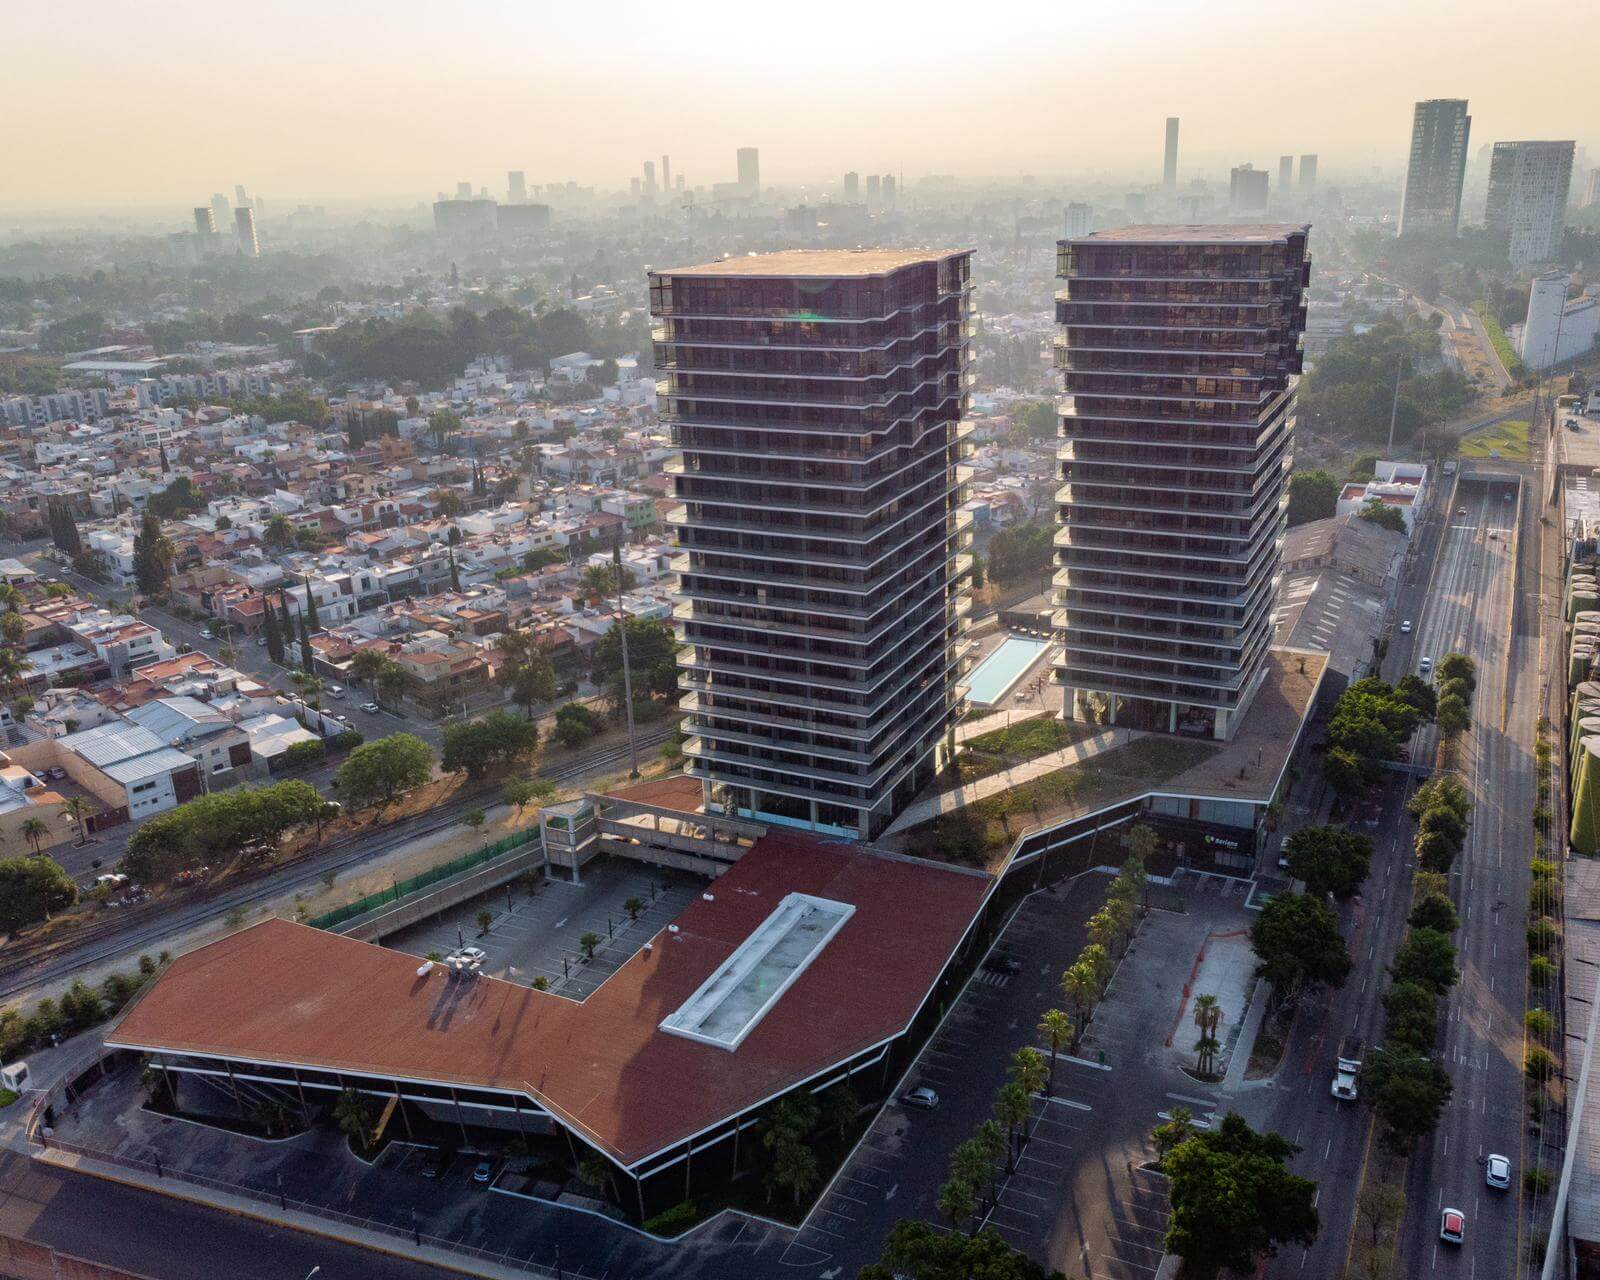 URBANIA <br> Mixed use residential development